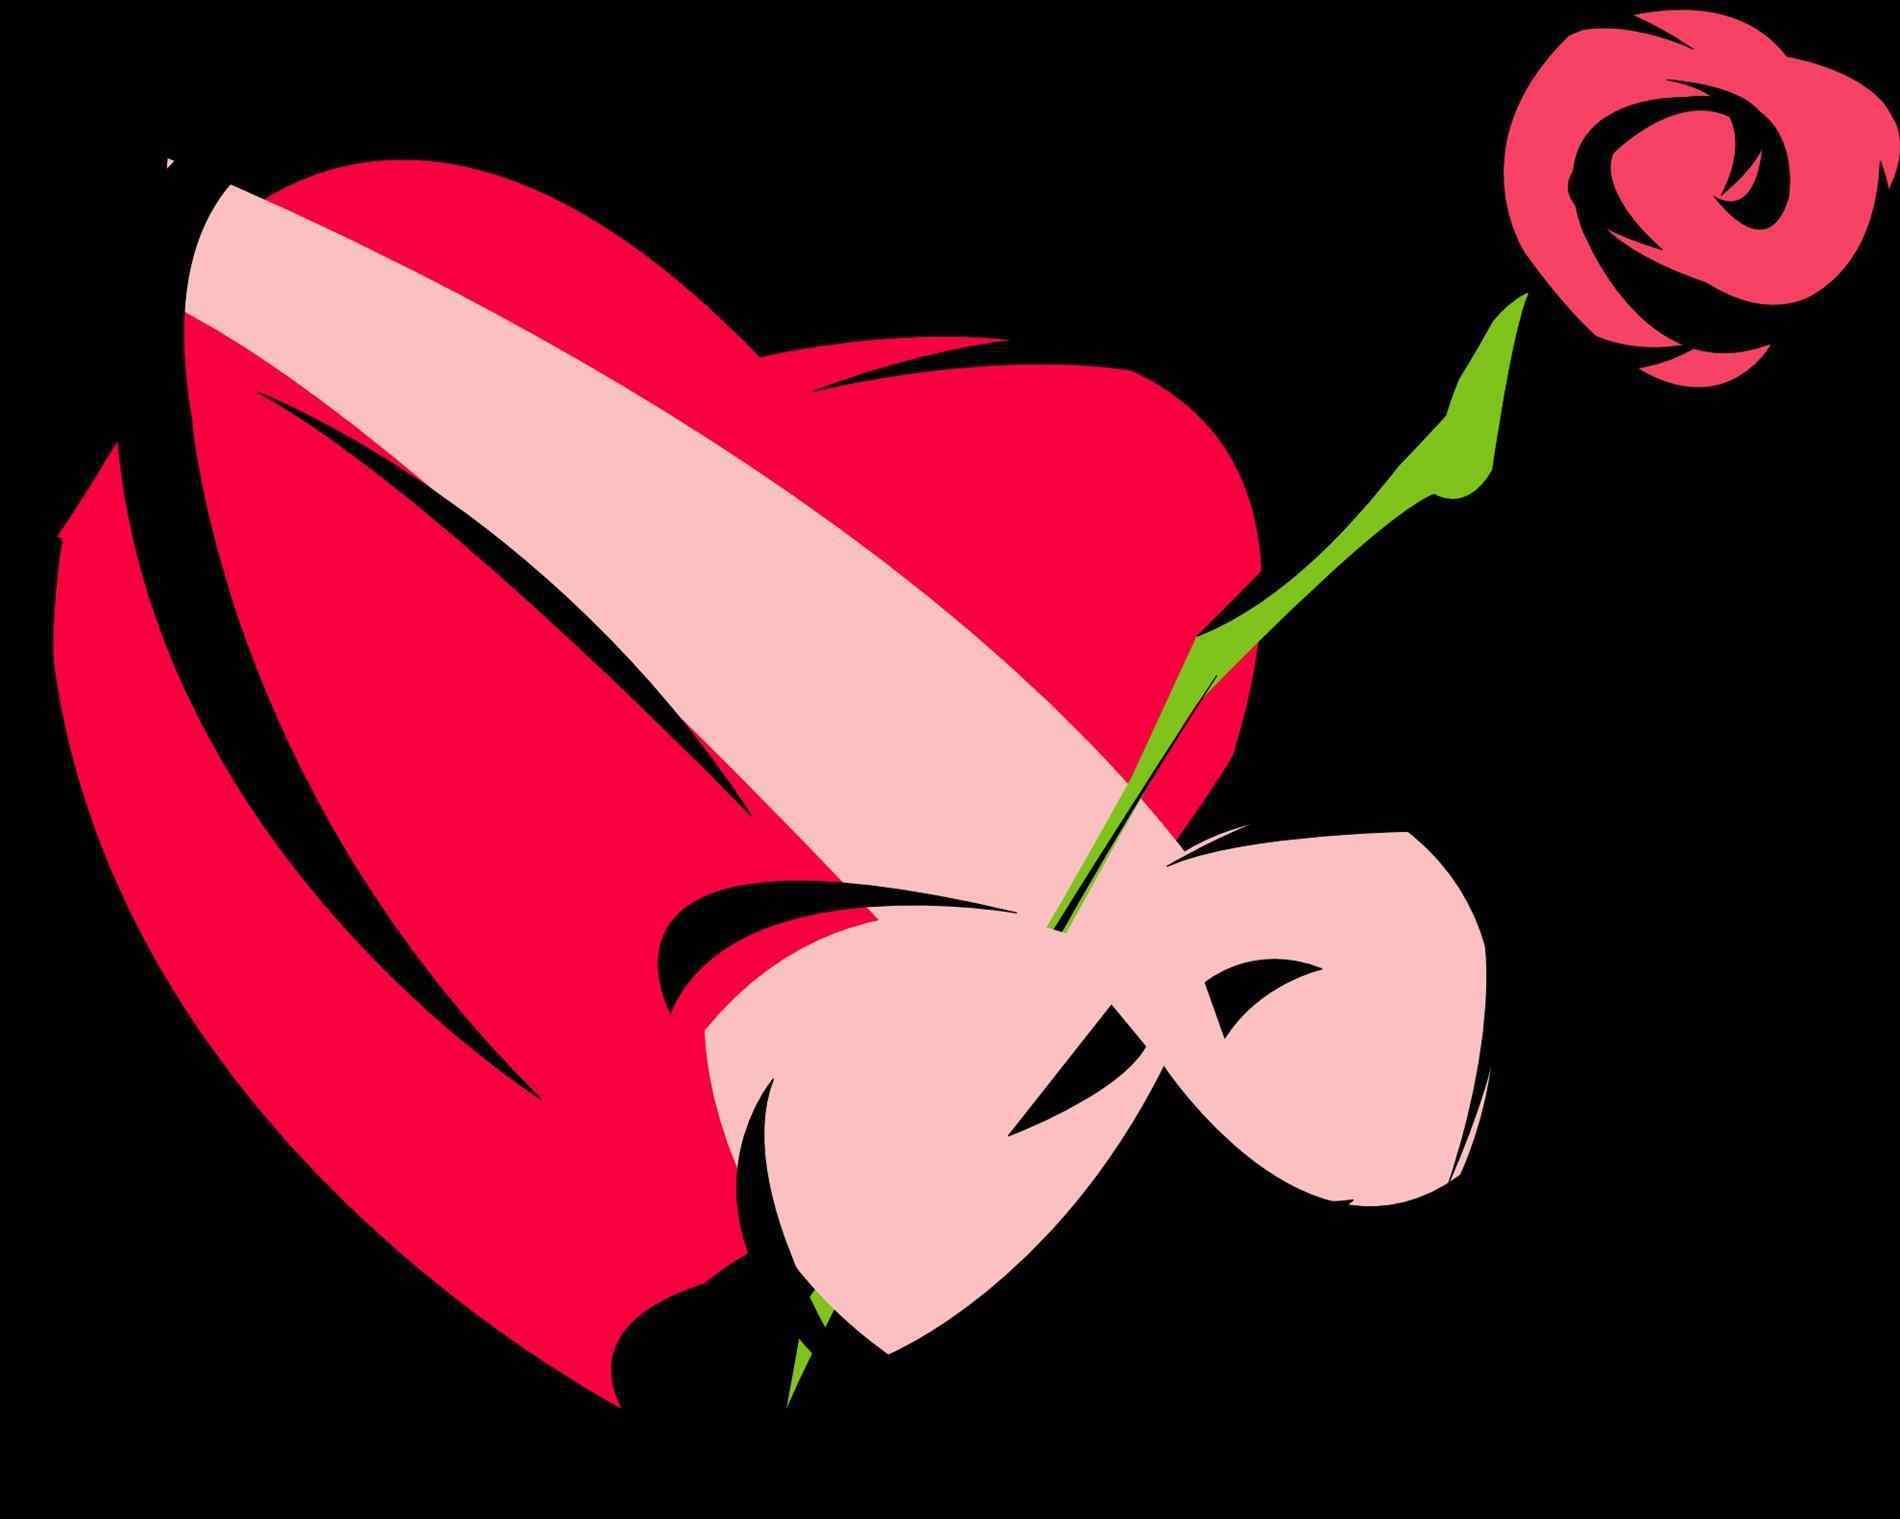 1900x1519 Hearts Free Download Clip Art Valentineus Clipart Symbol Pencil